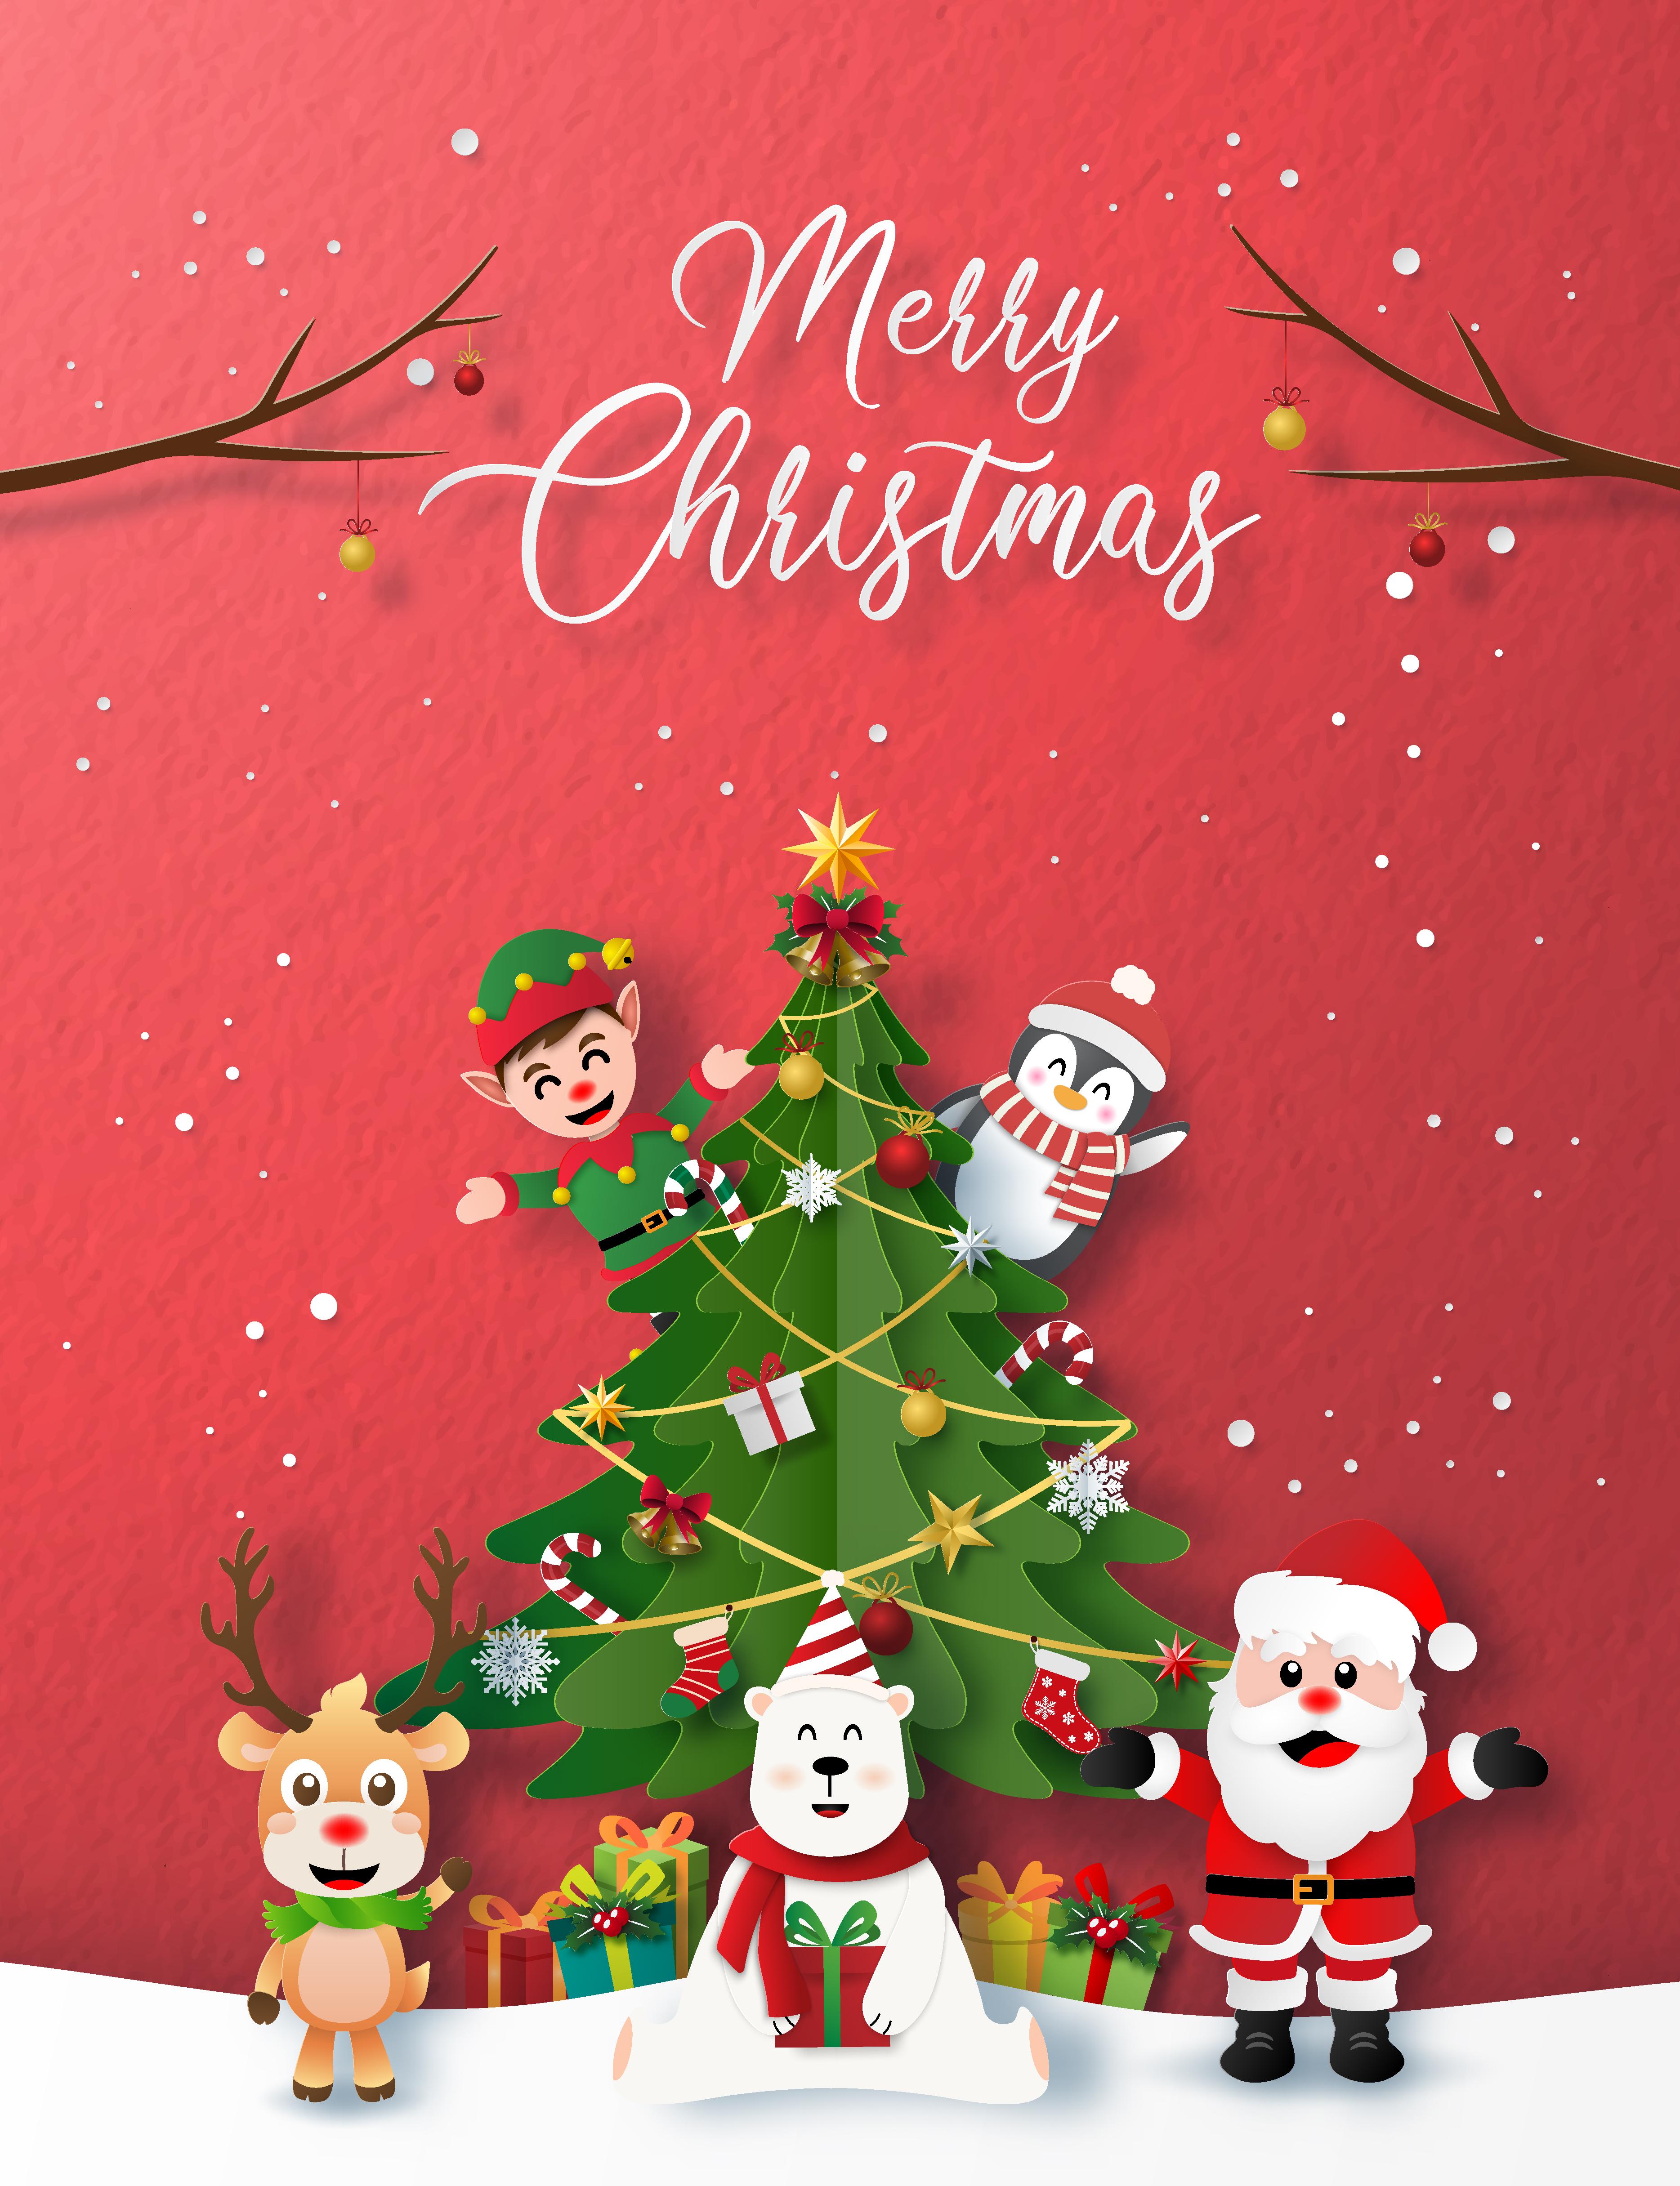 Merry Christmas Title SVG scrapbook cut file cute clipart ...  Merry Christmas Fractal Art